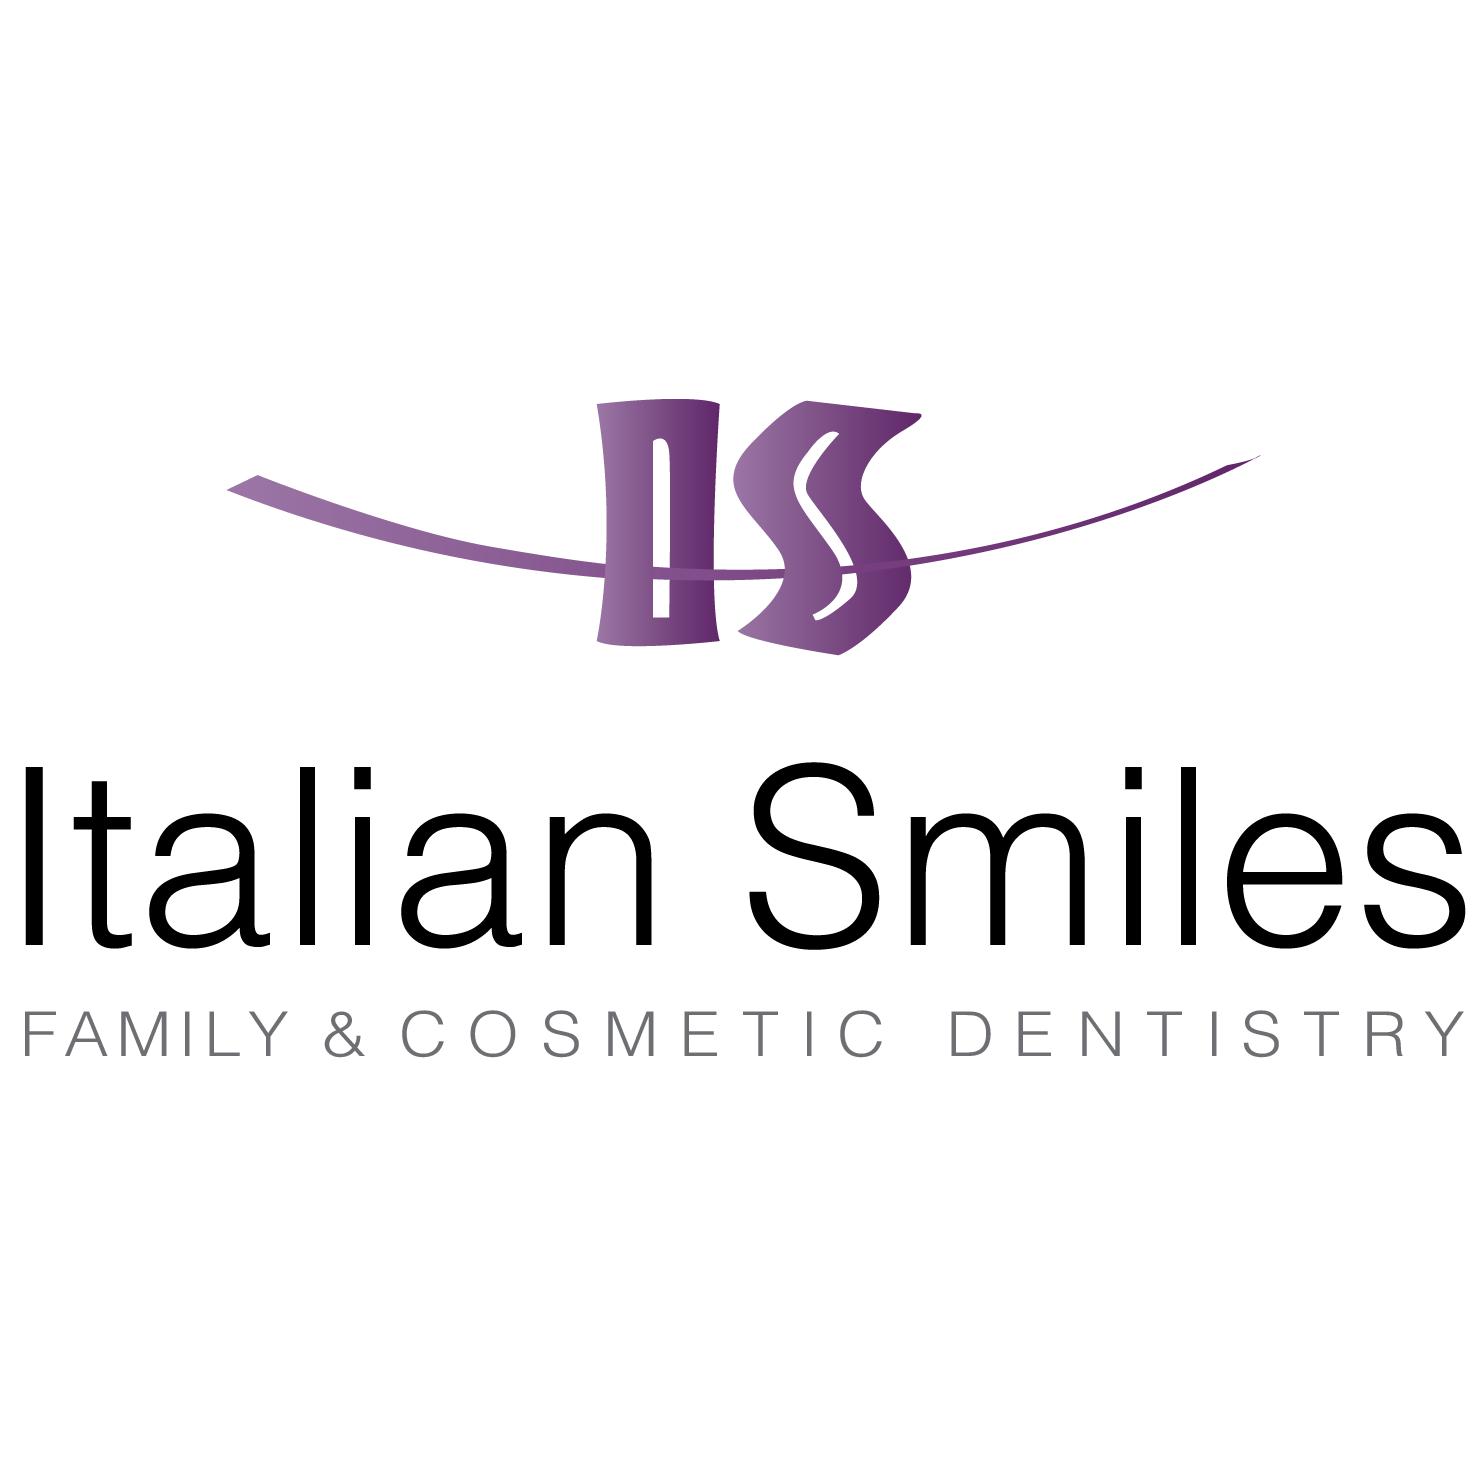 Italian Smiles Family & Cosmetic Dentistry